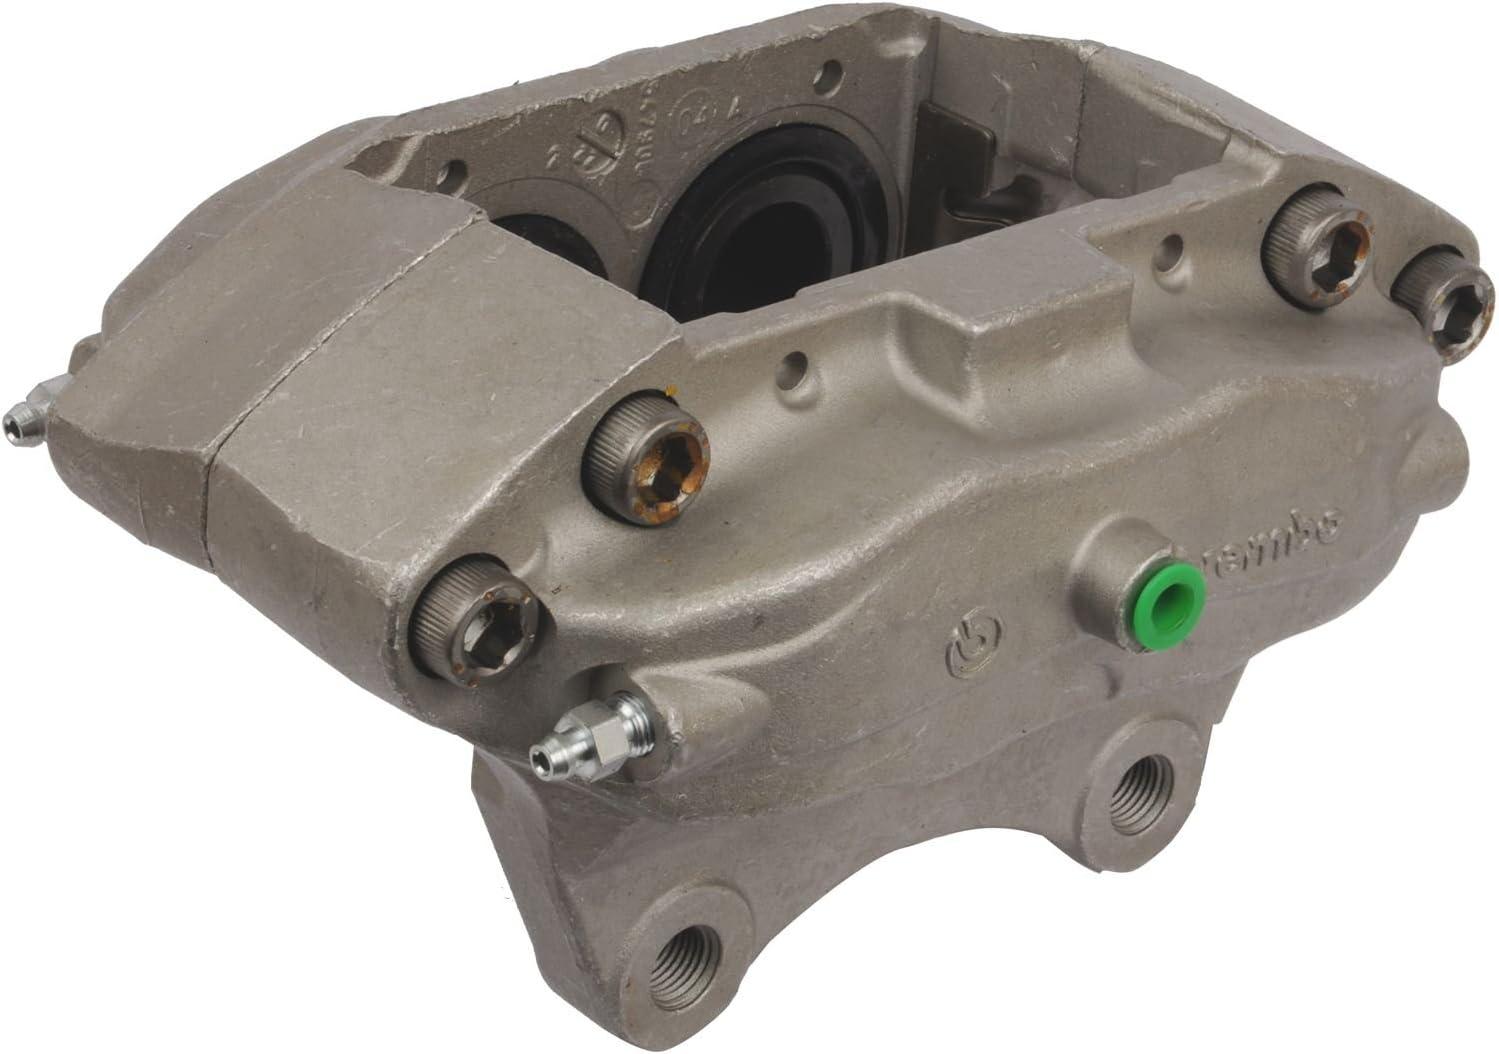 Disc Brake Caliper-Unloaded Caliper Front Left Cardone 19-3858 Reman